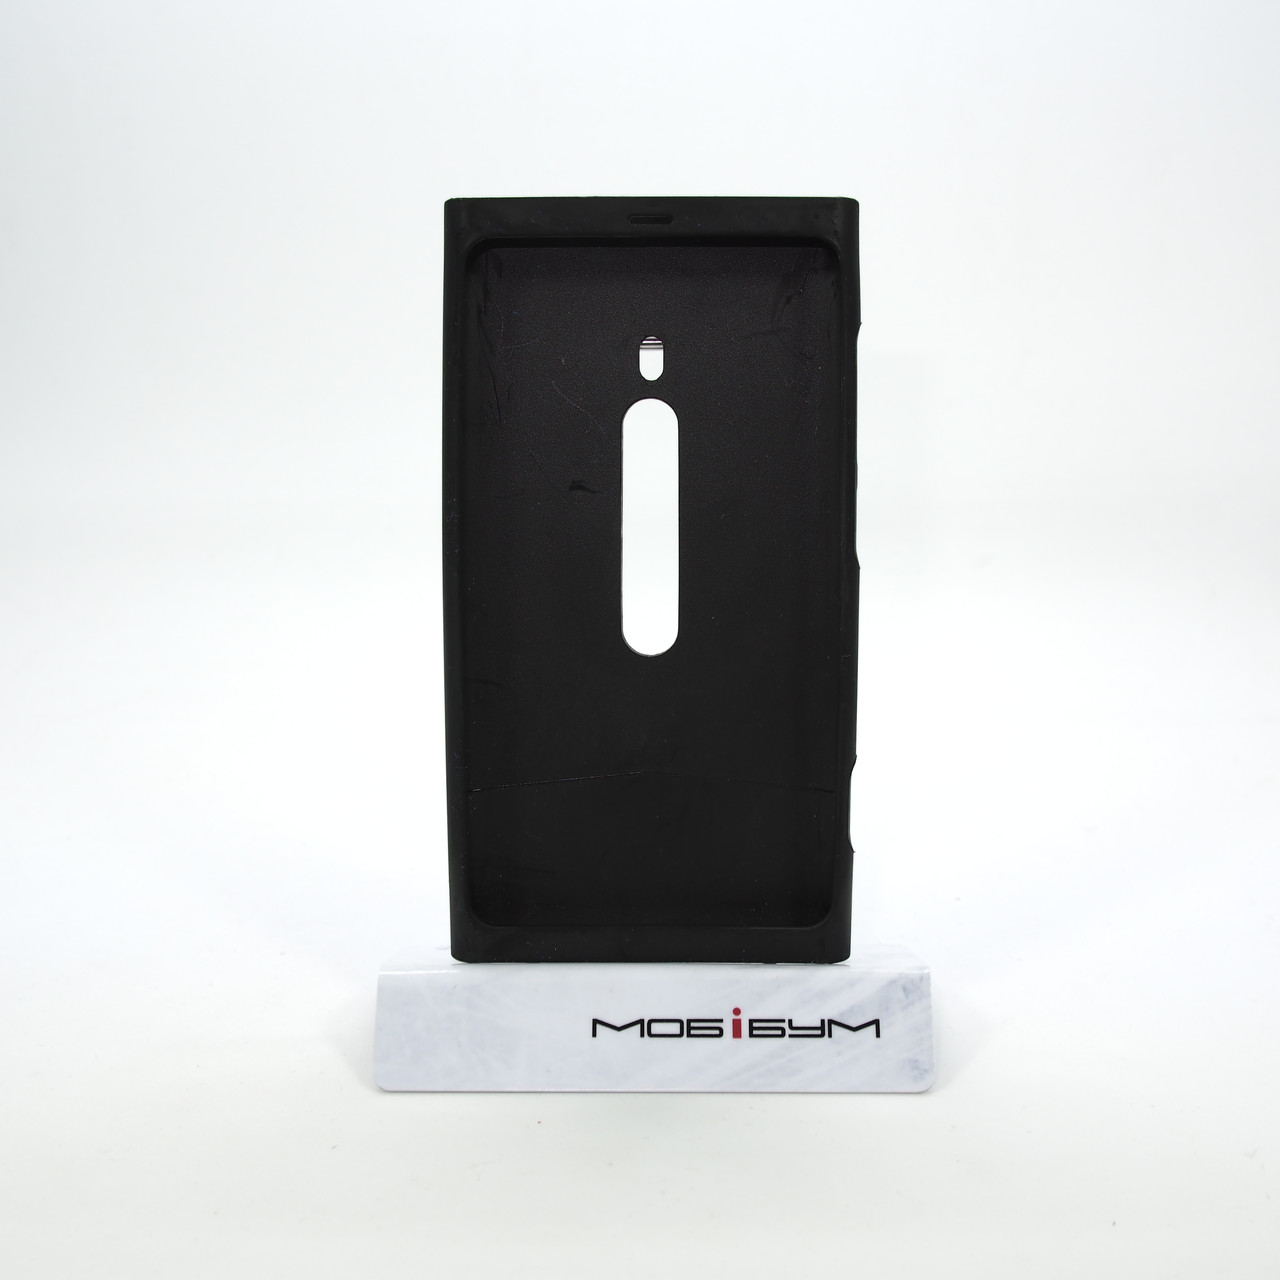 Чехлы для Nokia CC-1031 800 black